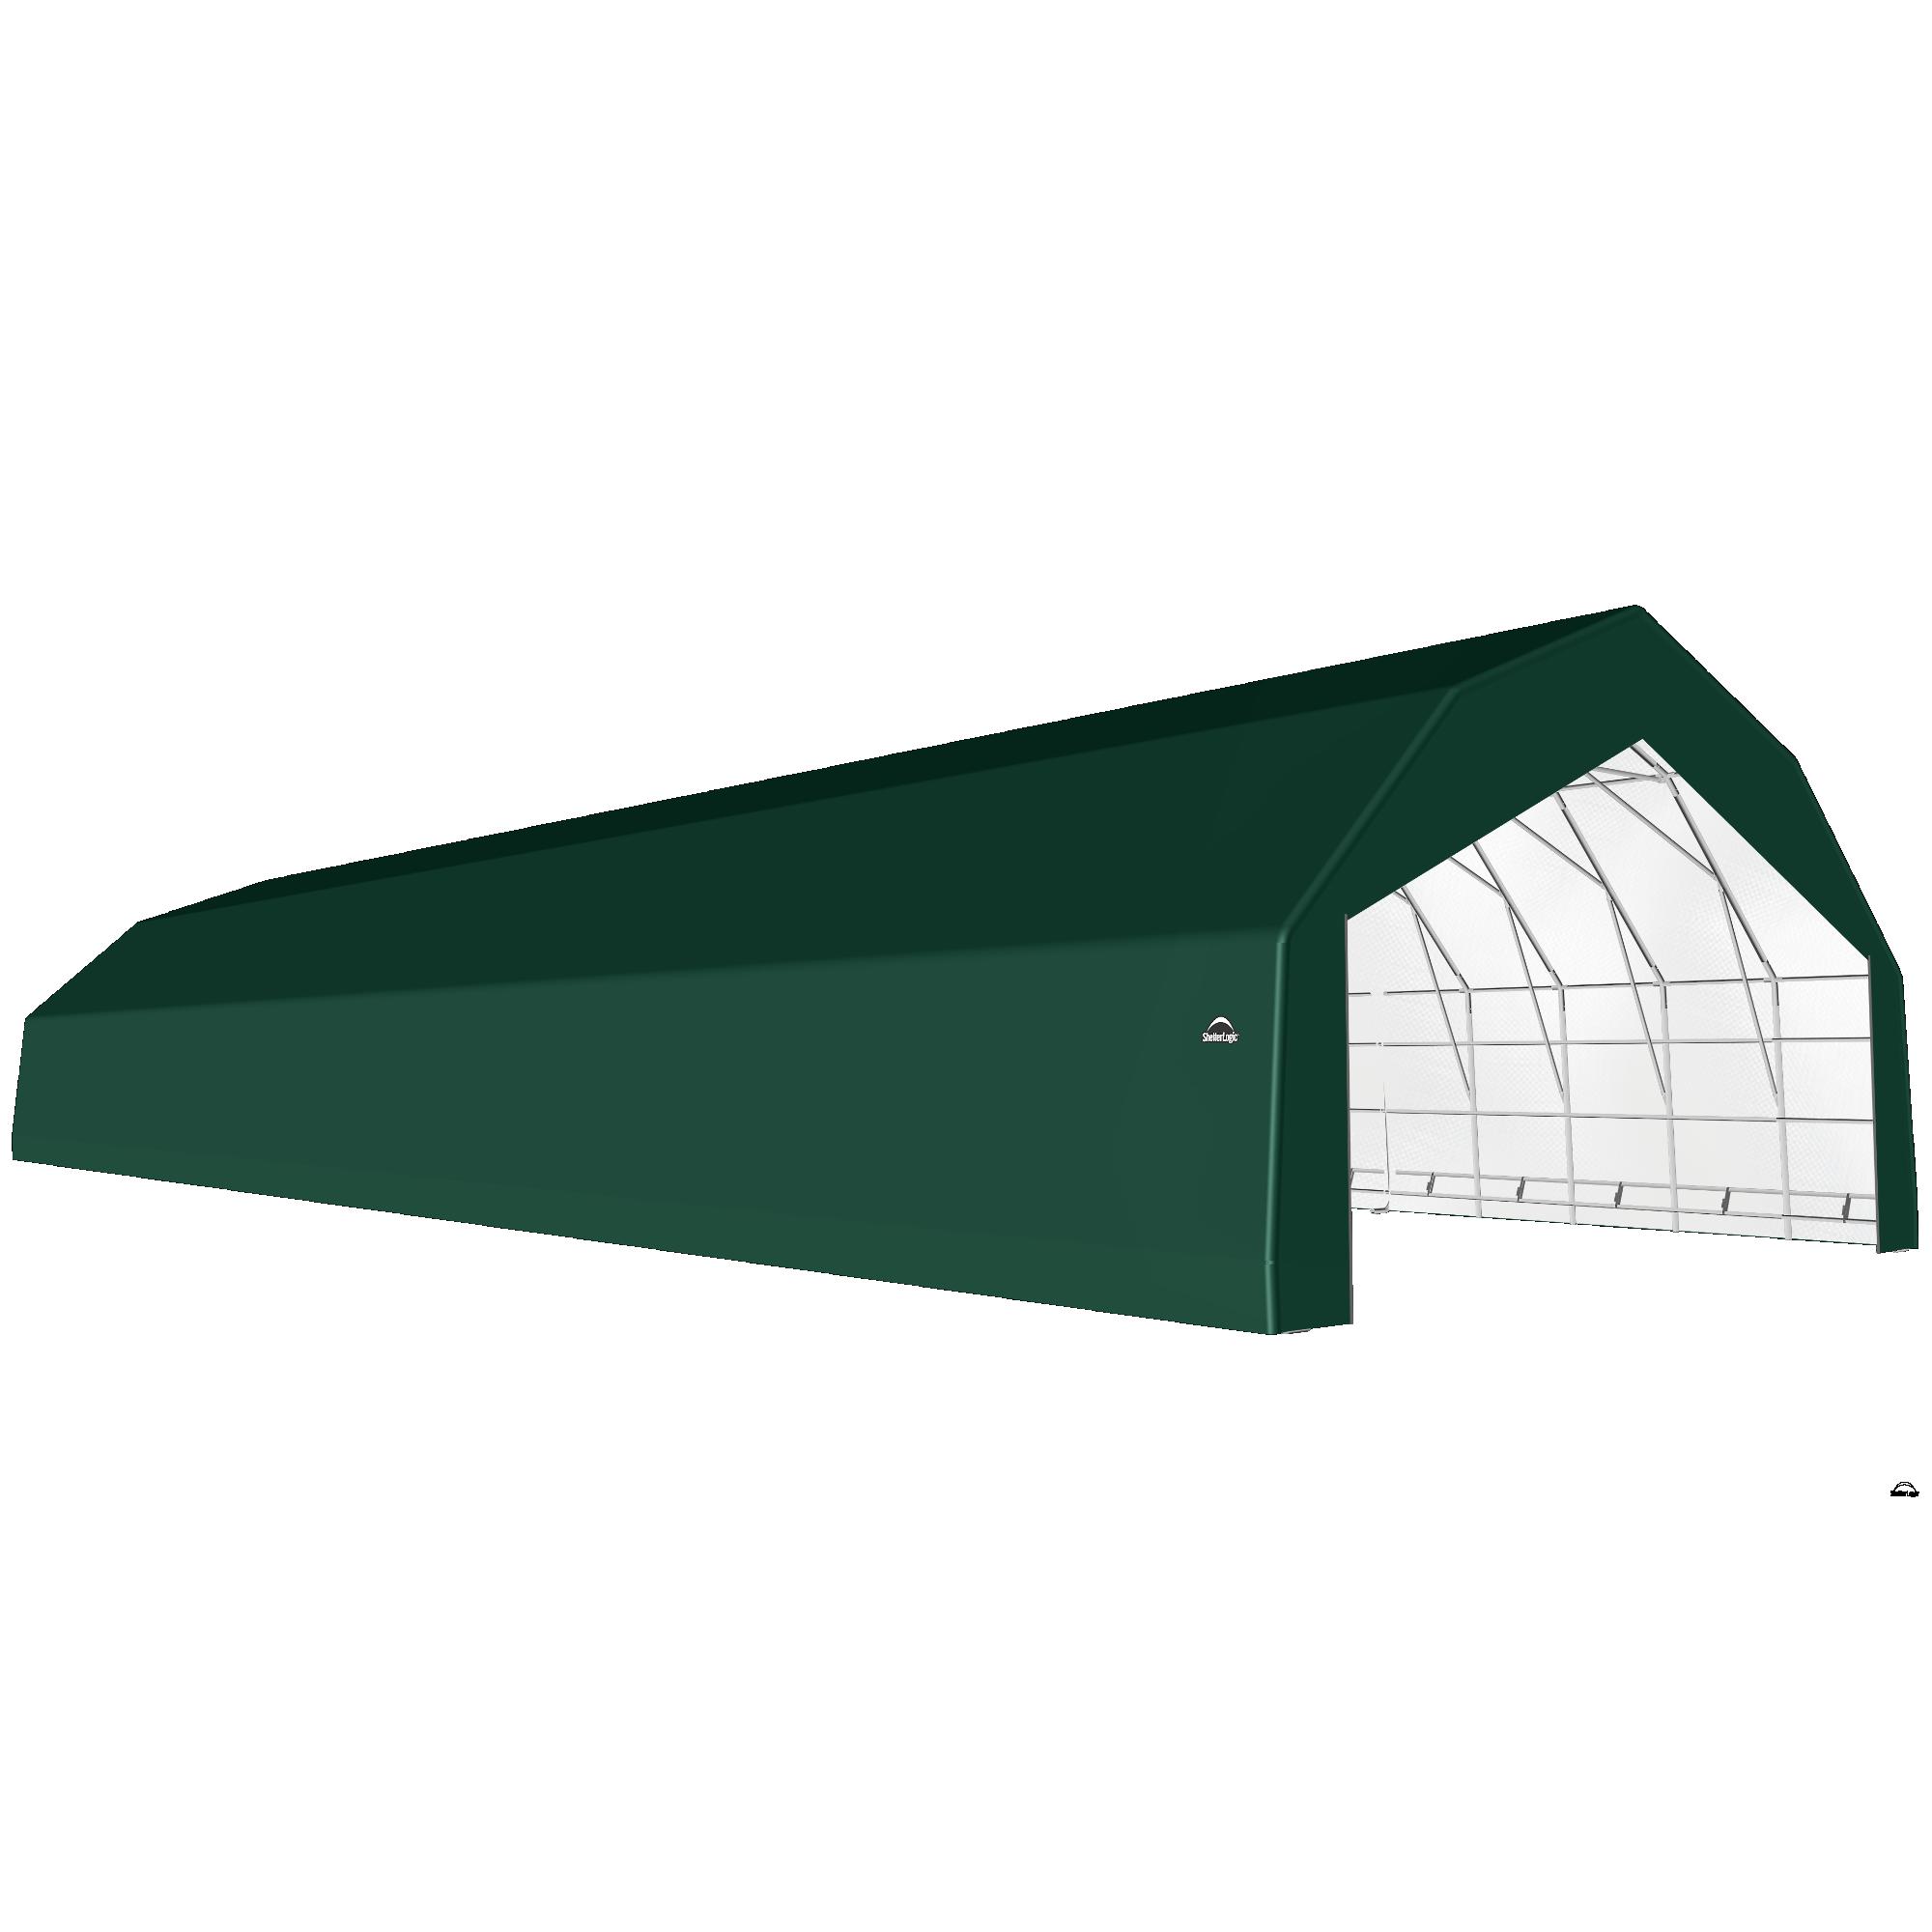 SP Barn 30X100X18 Green 14 oz PE Shelter